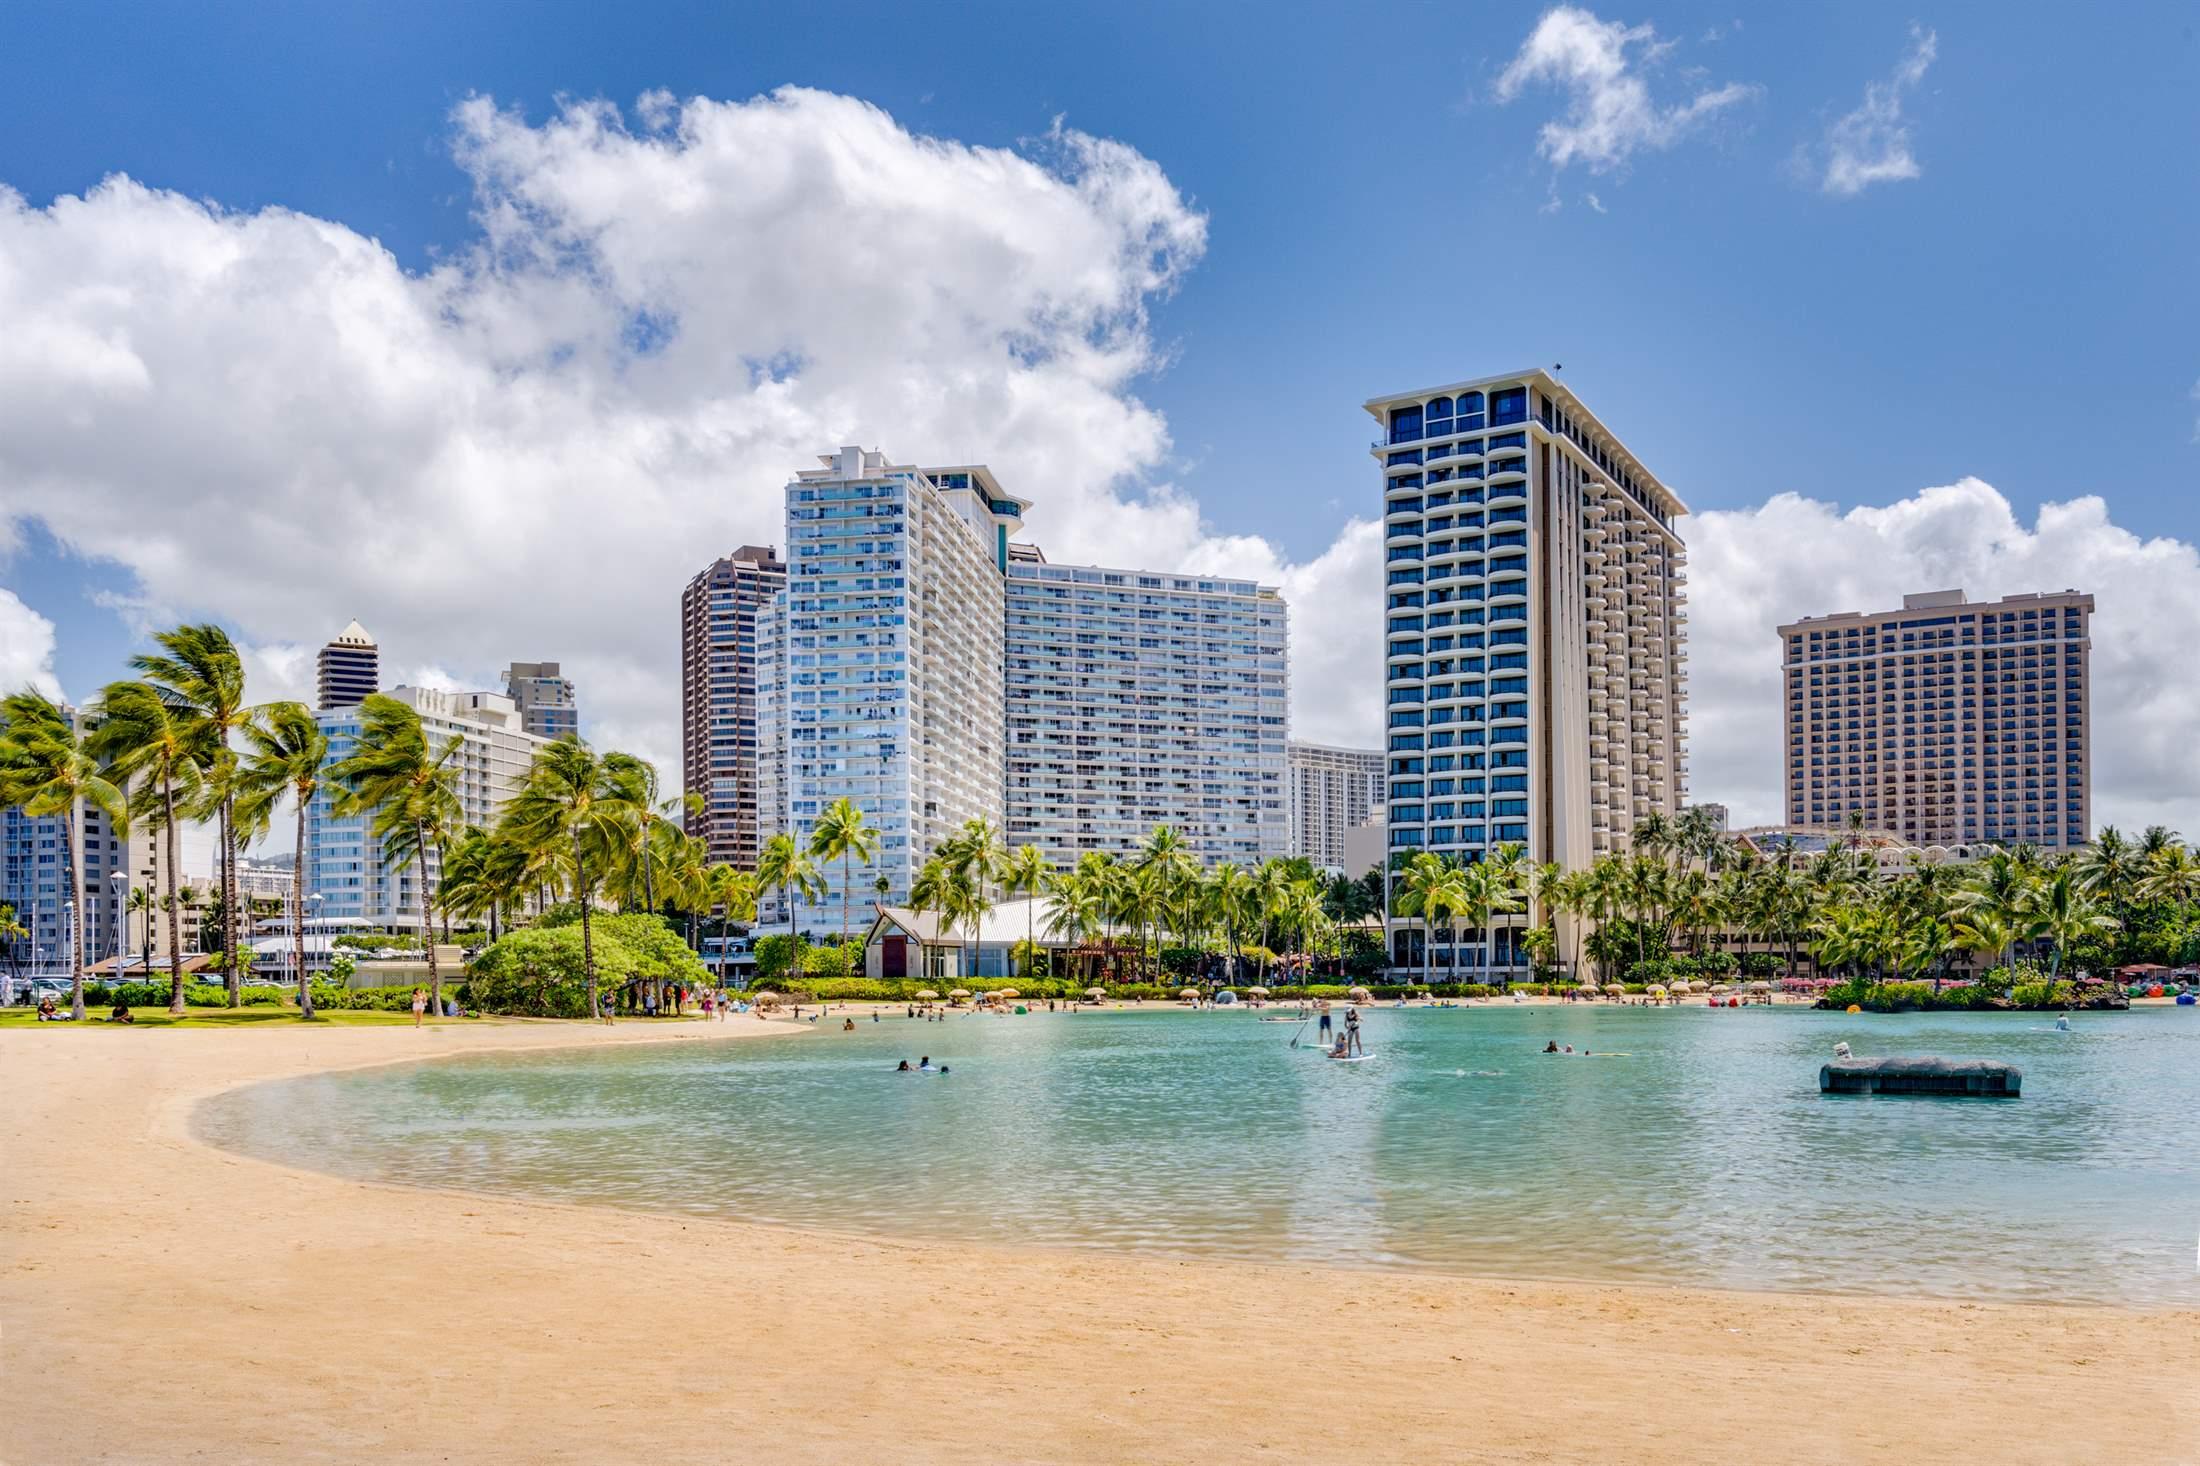 1777 Ala Moana Boulevard, #426, Honolulu, HI 96815